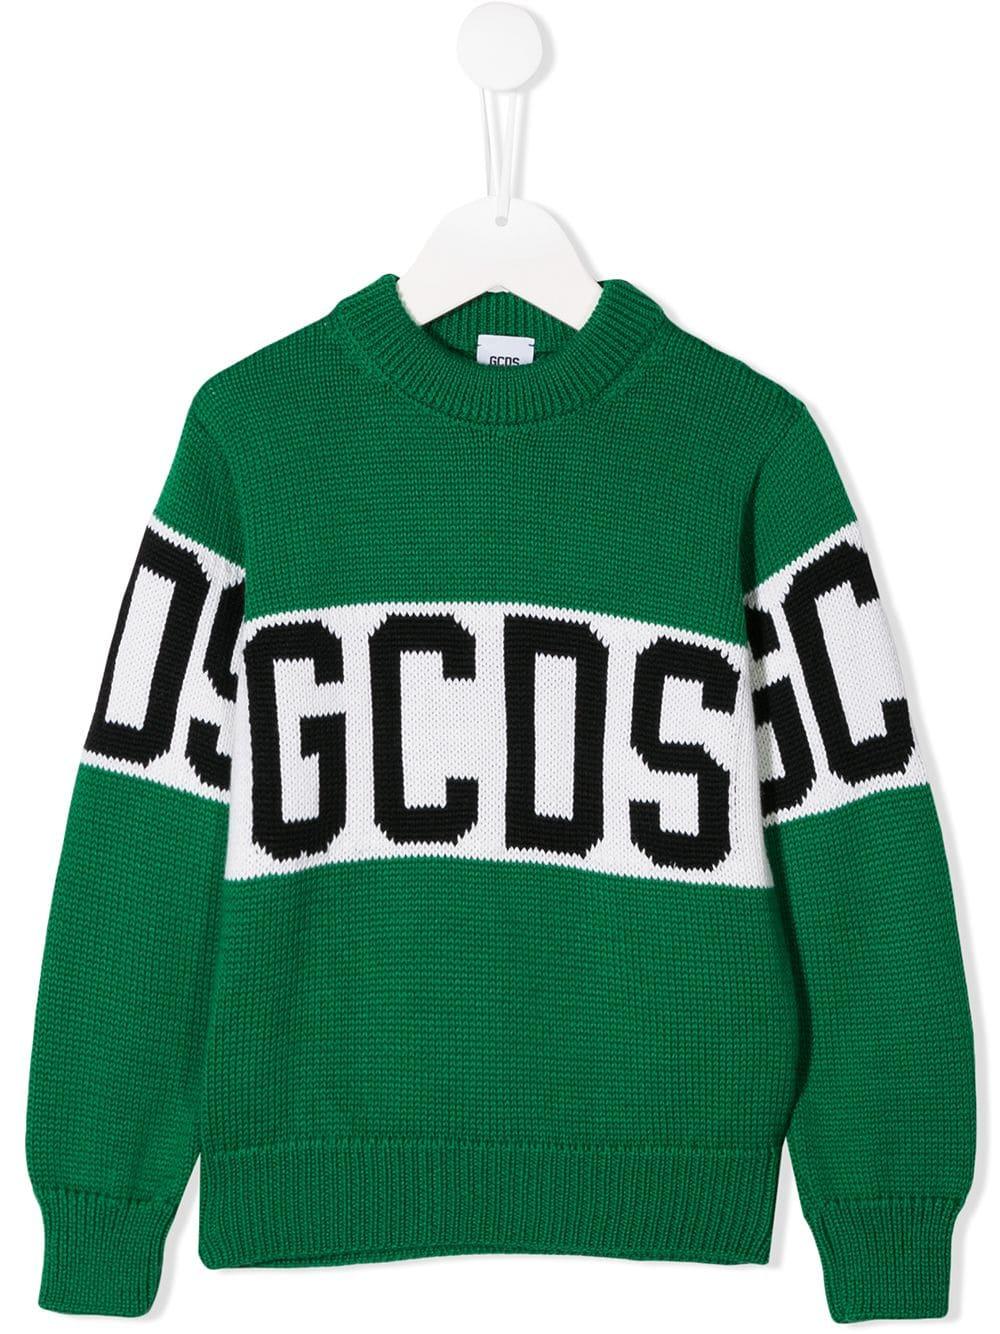 new styles 05b8c 0b4cd Maglione GCDS Kids Verde Con Logo